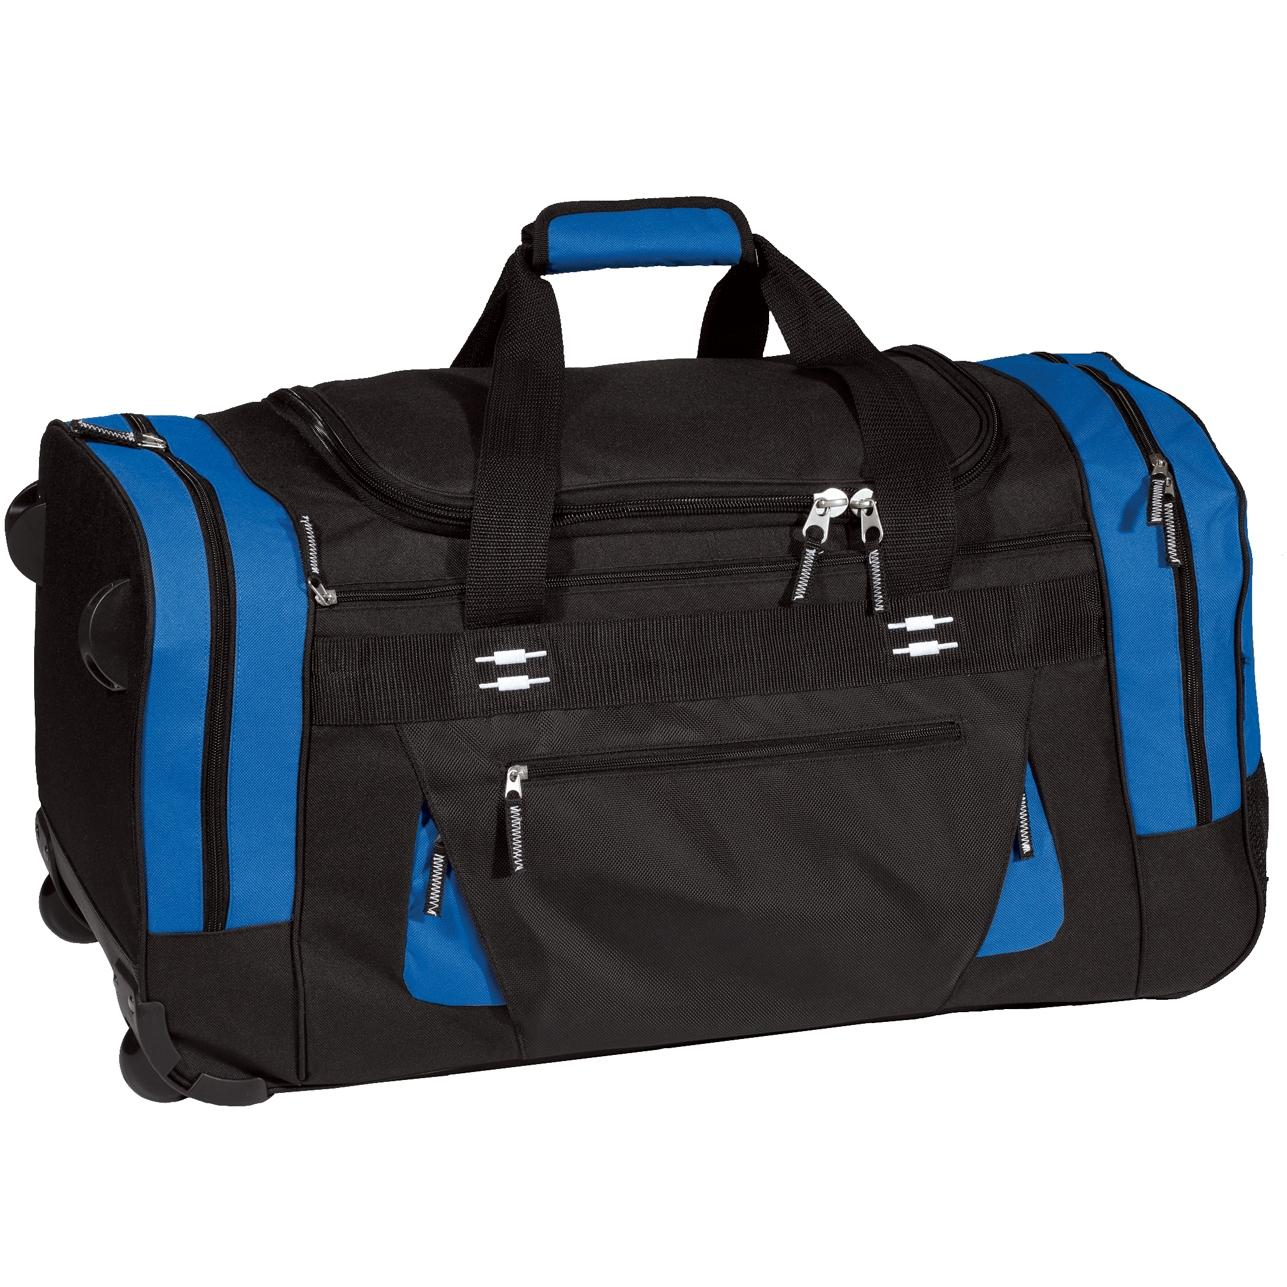 Port Authority Colorblock Rolling Duffel Bag - Marina Blue